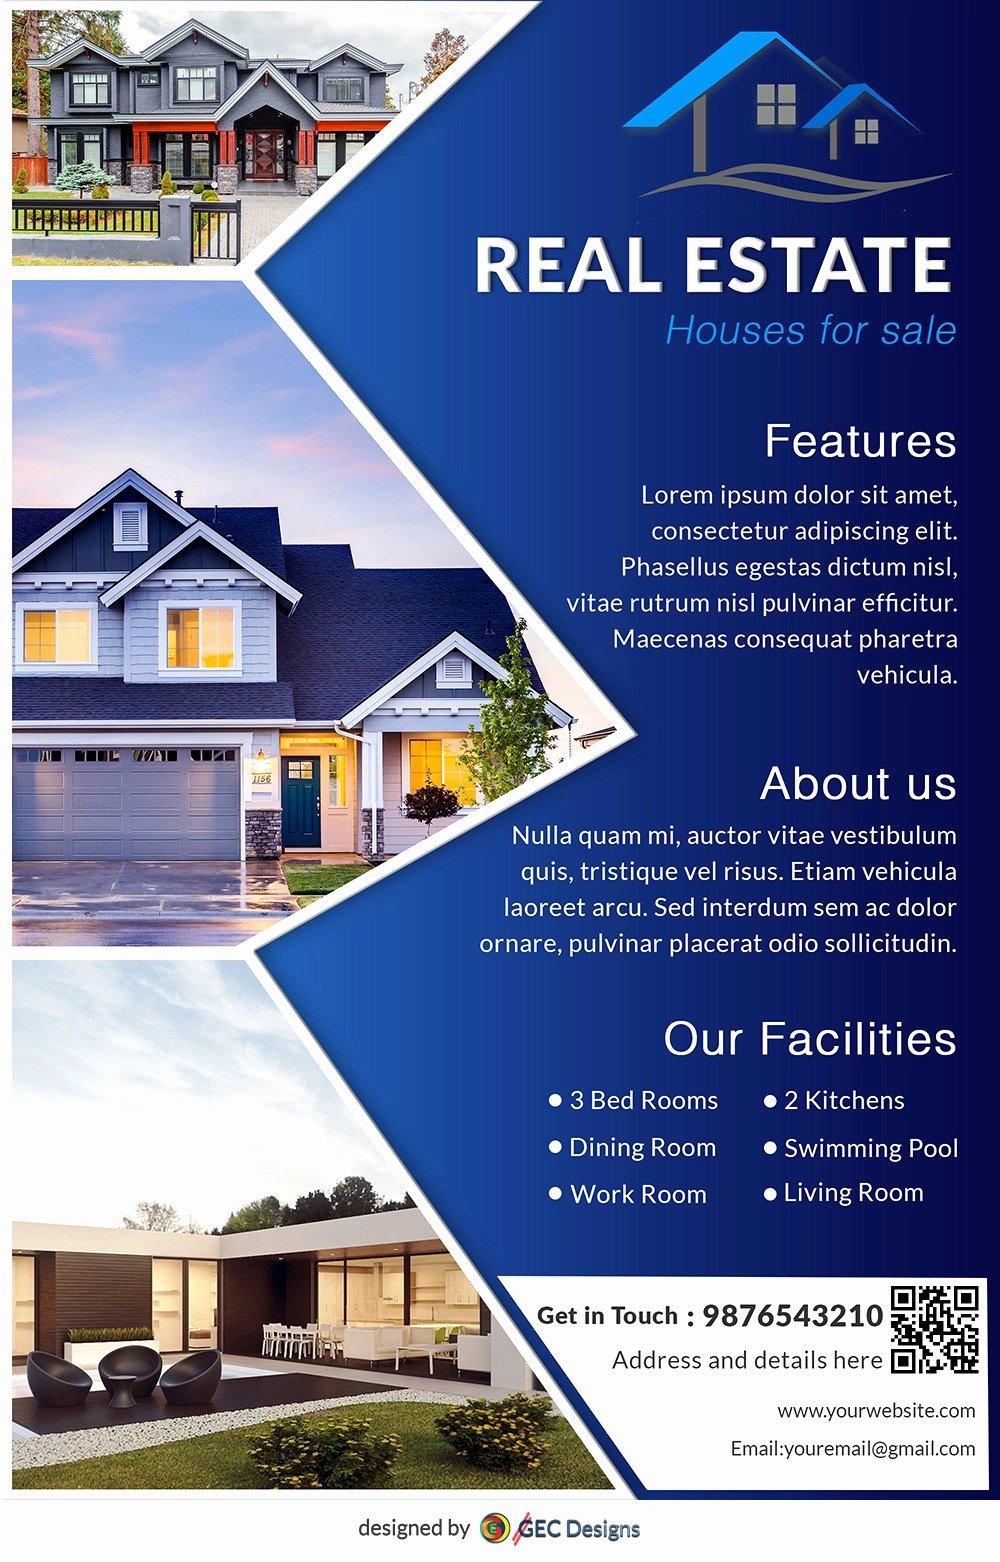 Home for Sale Flyer Best Of Download Free House for Sale Real Estate Flyer Design